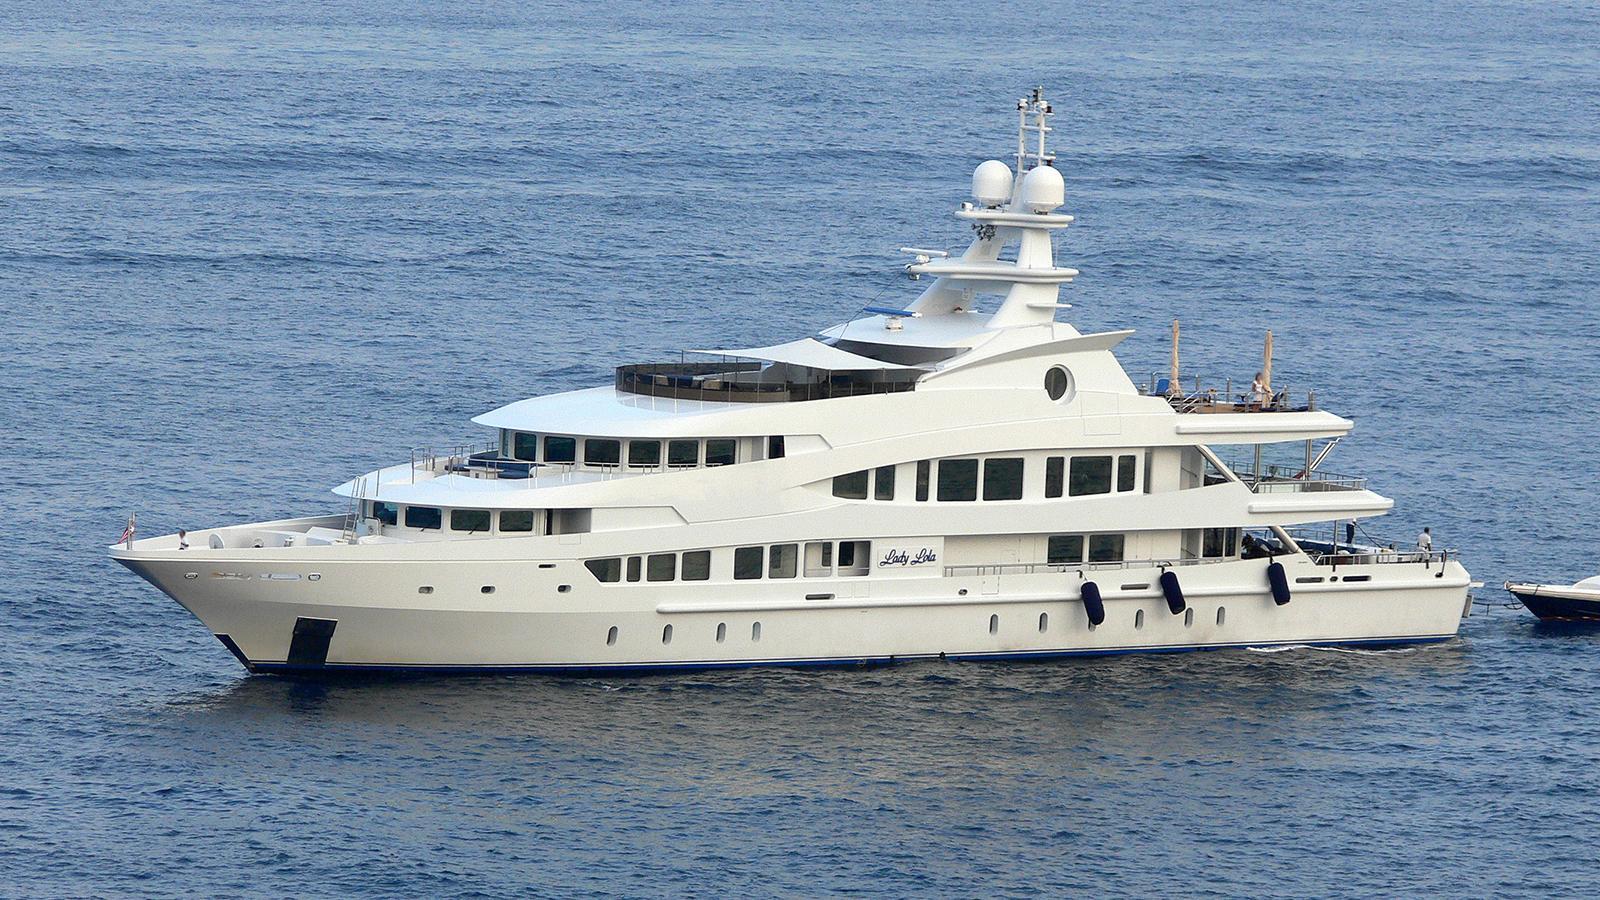 lucky lady lady lola motoryacht oceanco 2002 63m profile